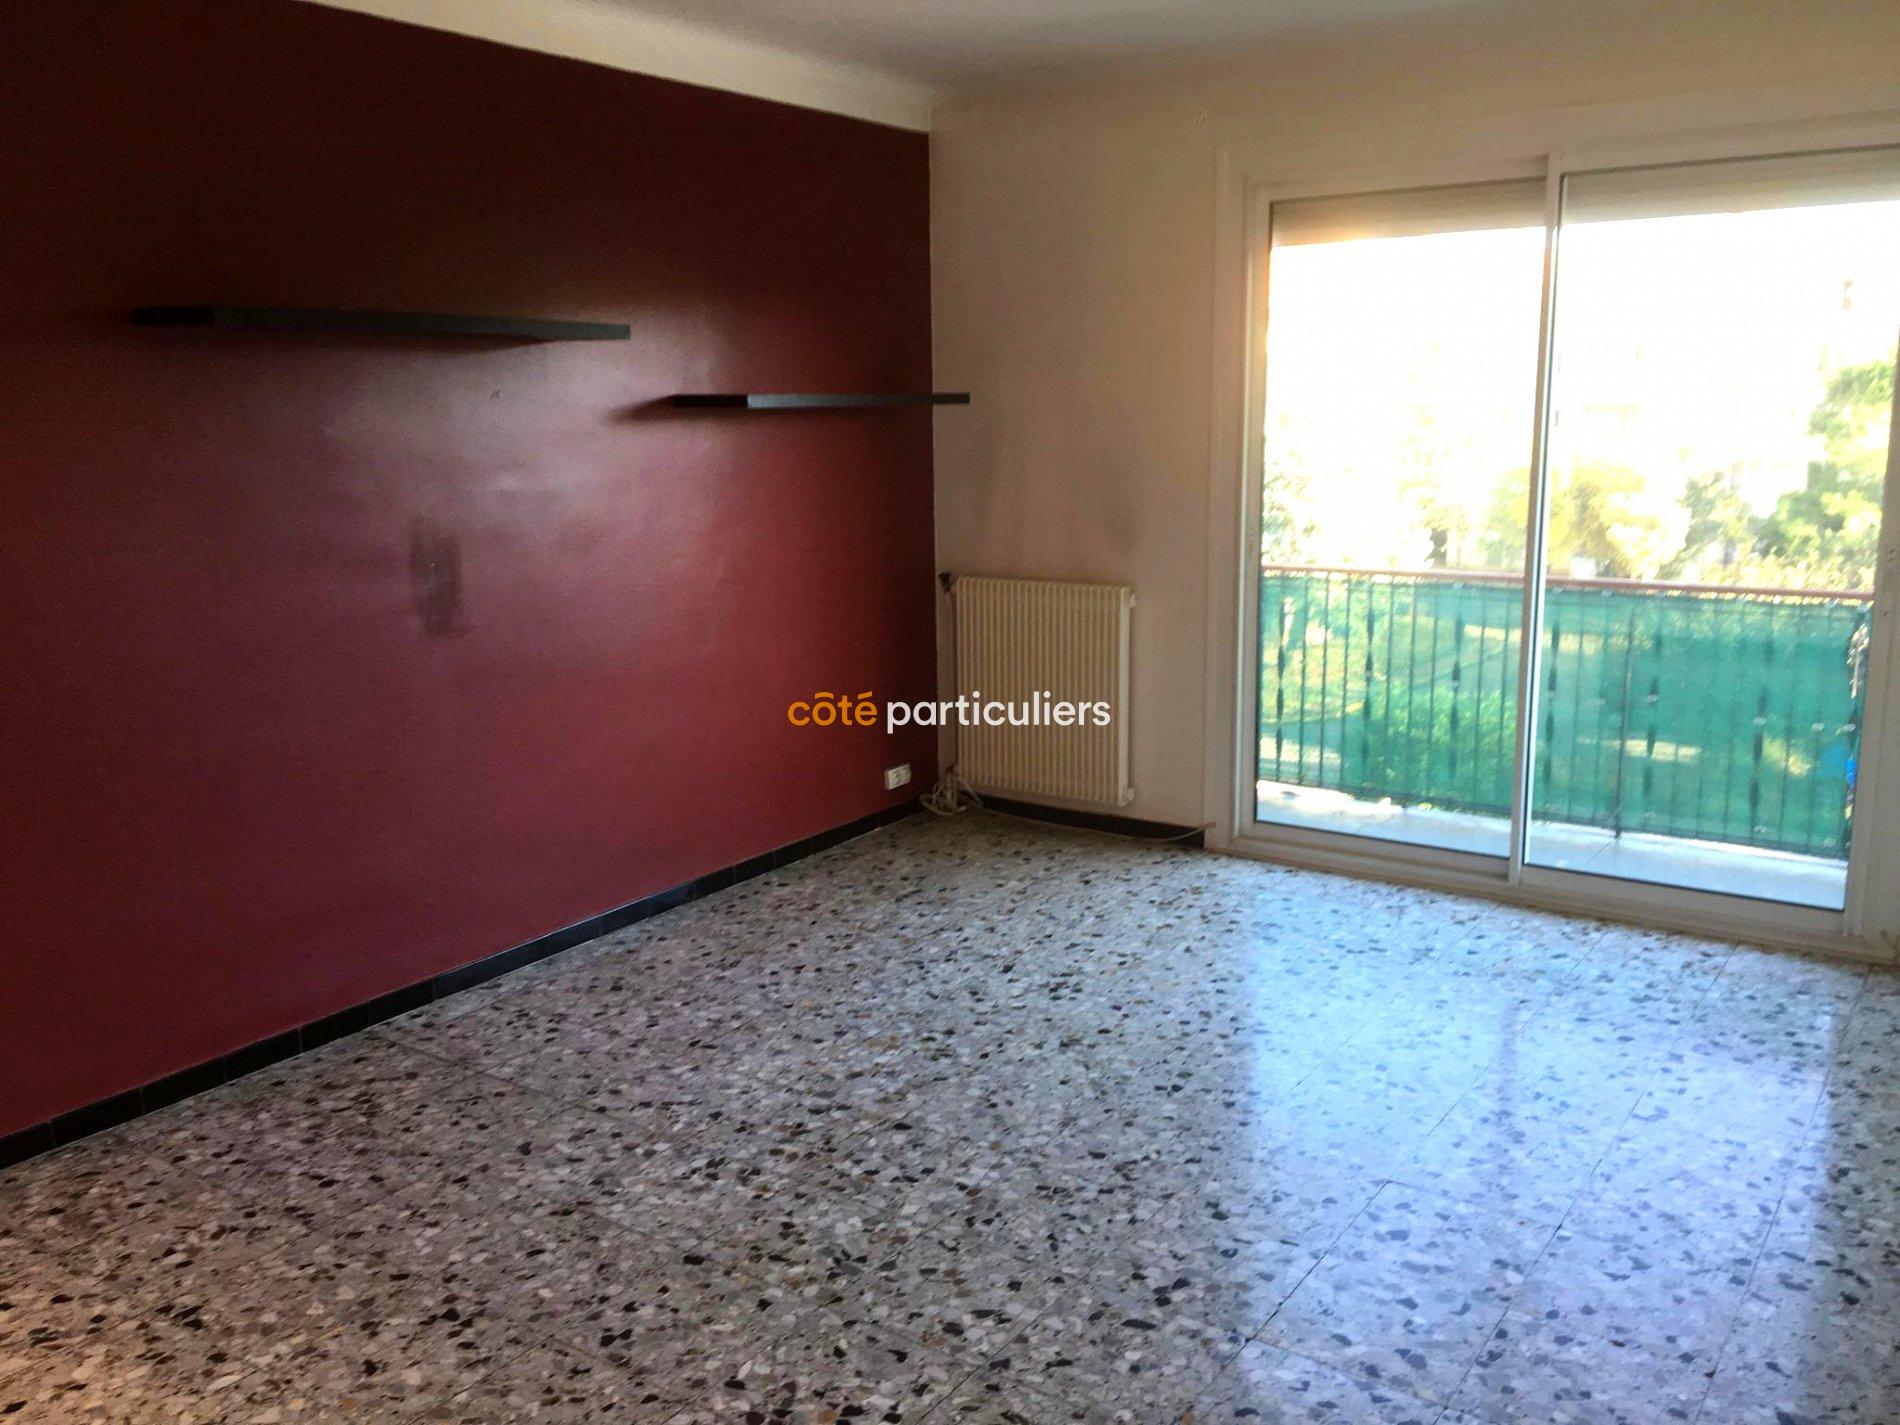 annonce vente appartement perpignan 66000 72 m 126 900 992739999793. Black Bedroom Furniture Sets. Home Design Ideas